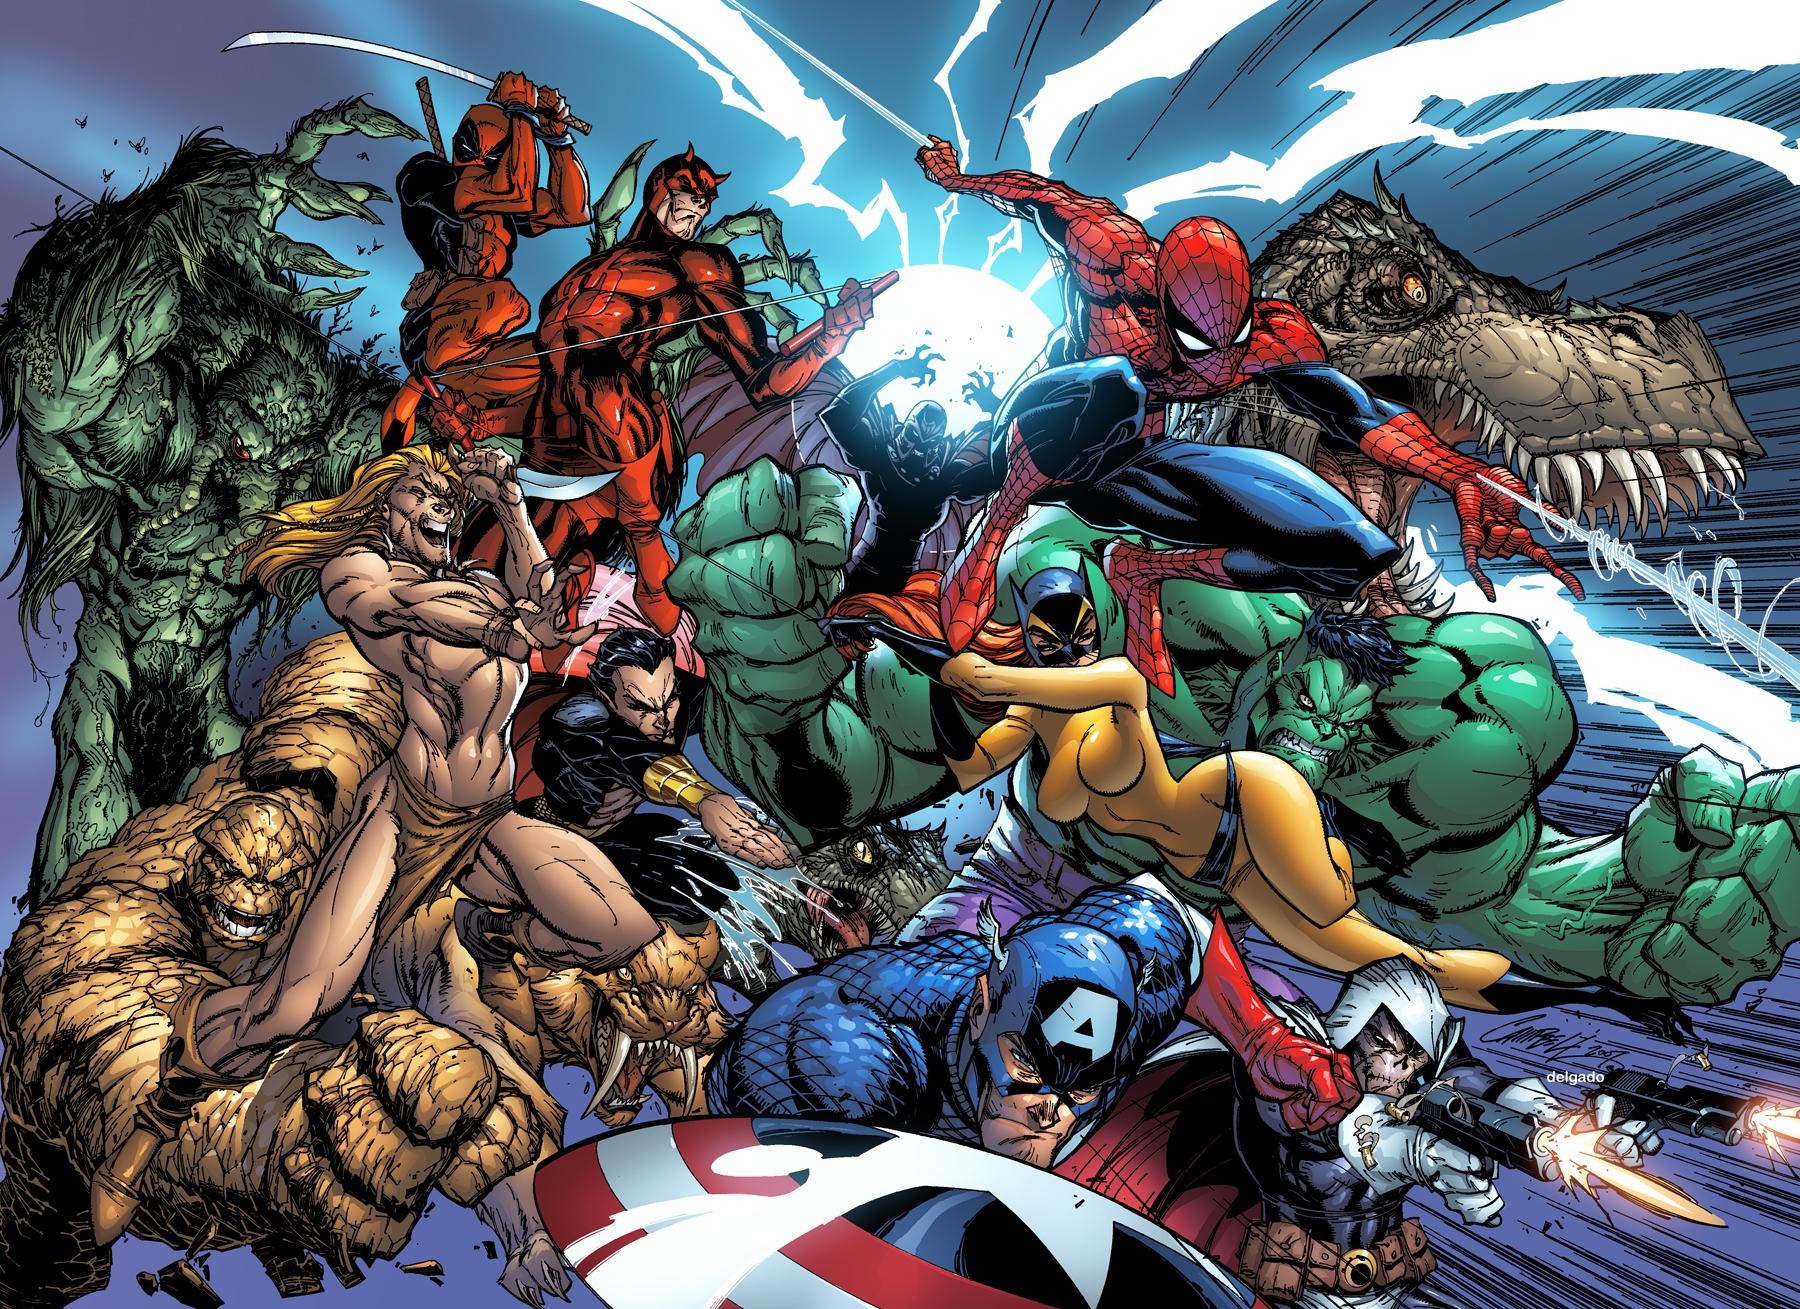 Képek - Page 4 Marvel_comics_presents_color_by_j_scott_campbell-d1azwiv